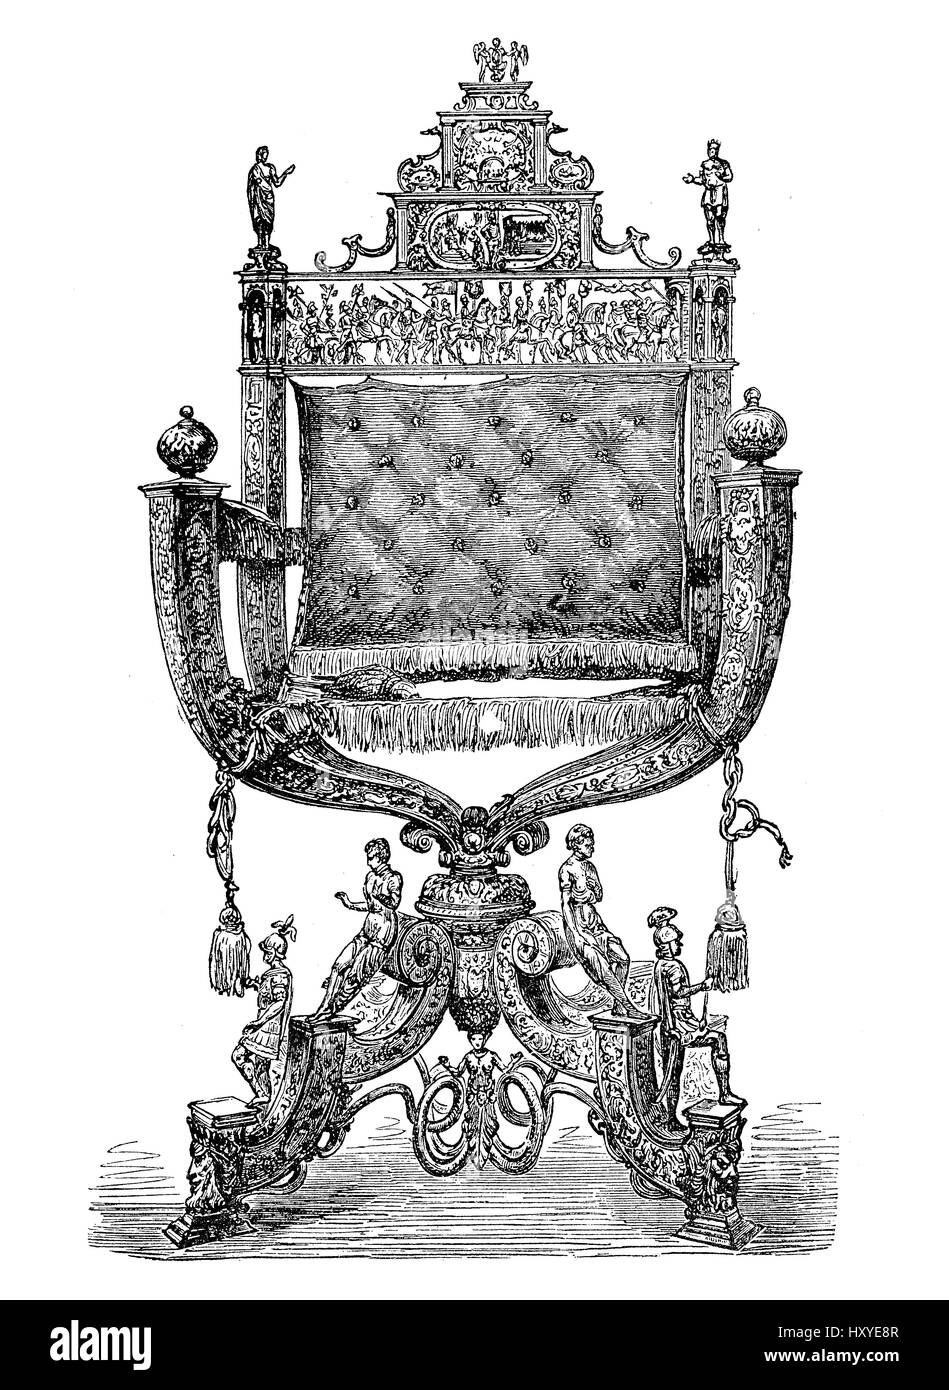 Baroque armchair, present of Augsburg  German city to Holy Roman Emperor Rudolf II prince of Austria, XVI century - Stock Image